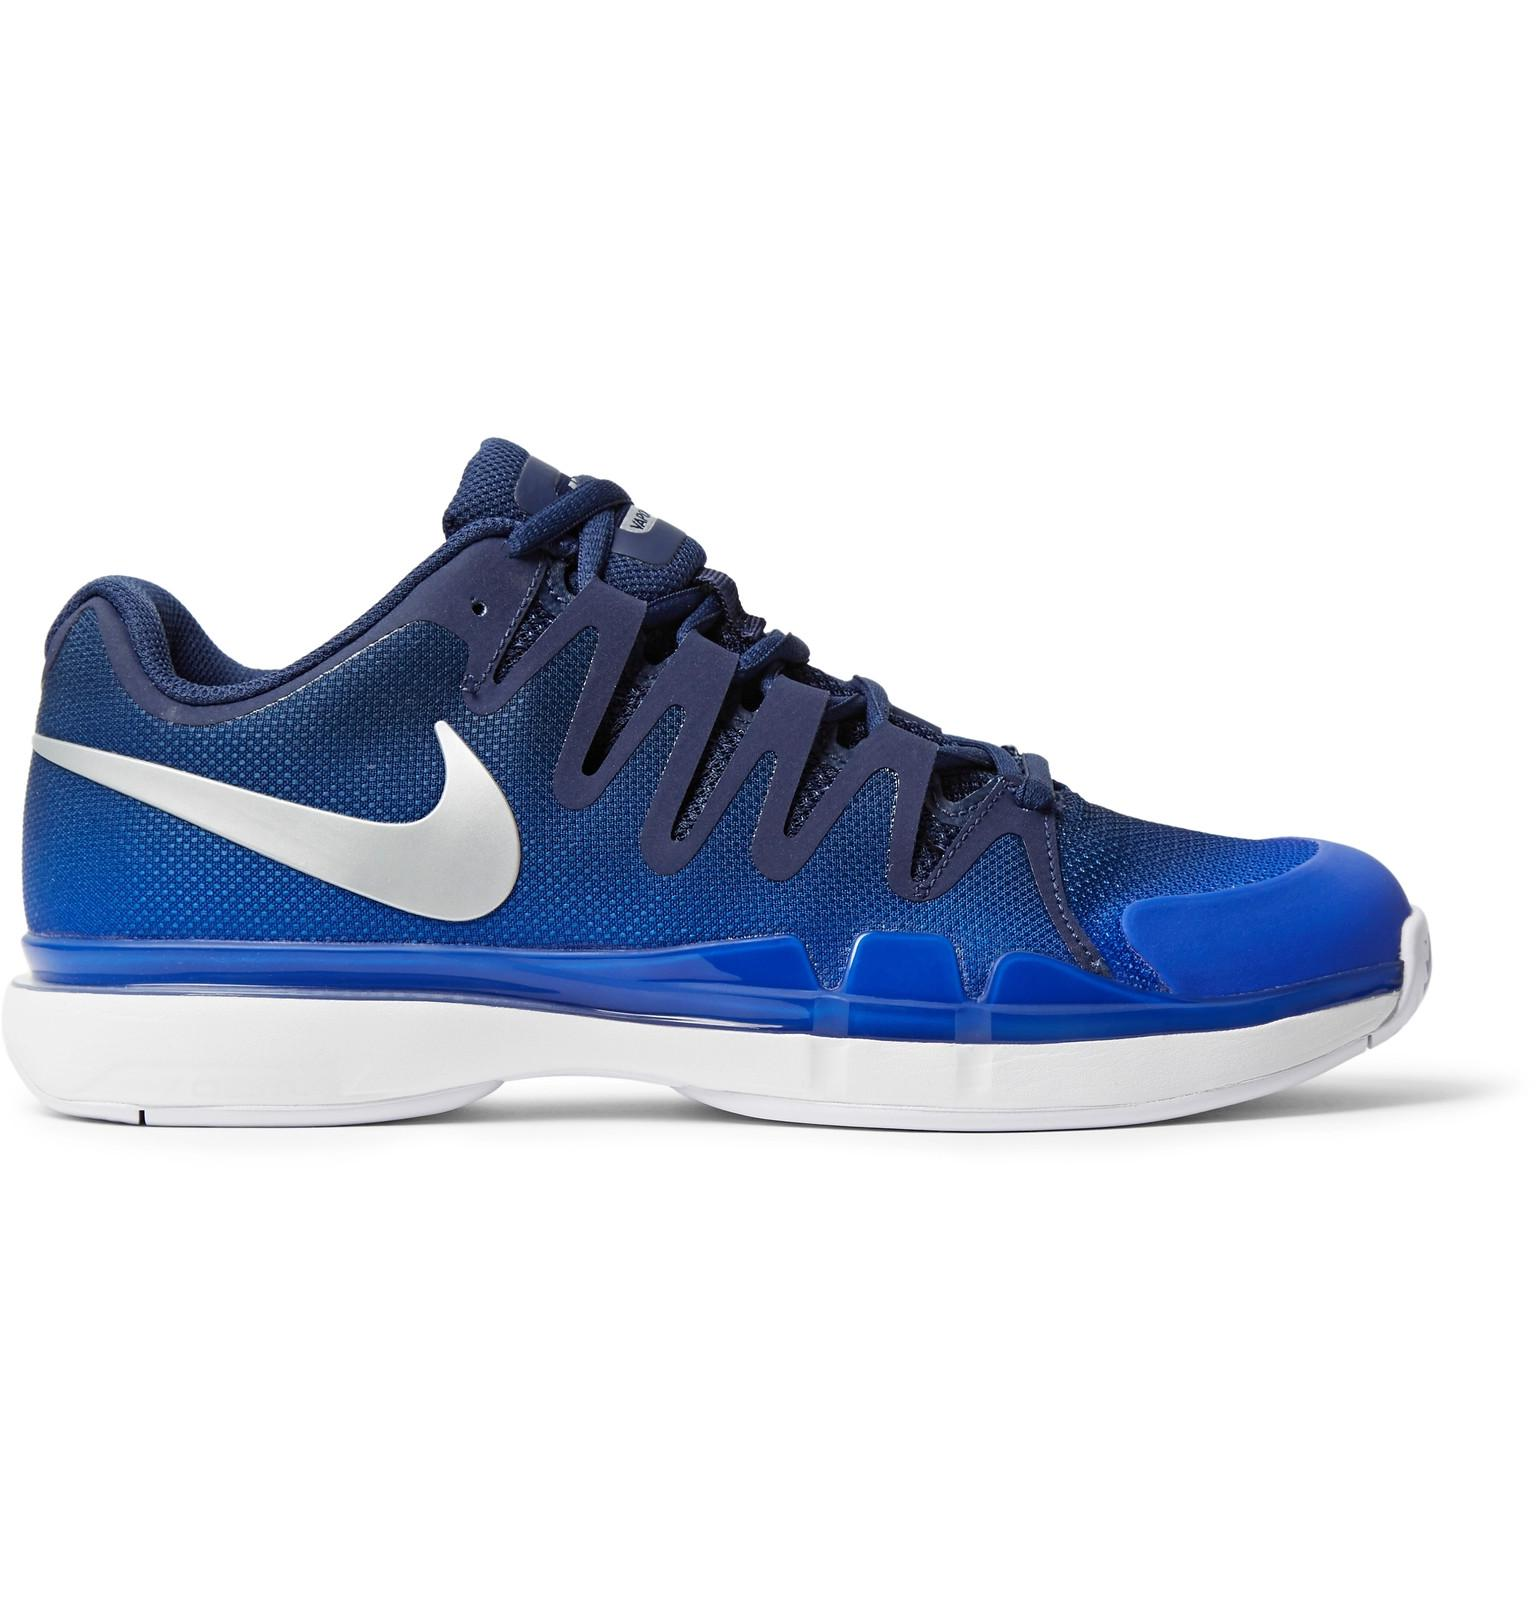 Nike. Men's Blue Zoom Vapor 9.5 Tour Rubber-trimmed Mesh Tennis Sneakers